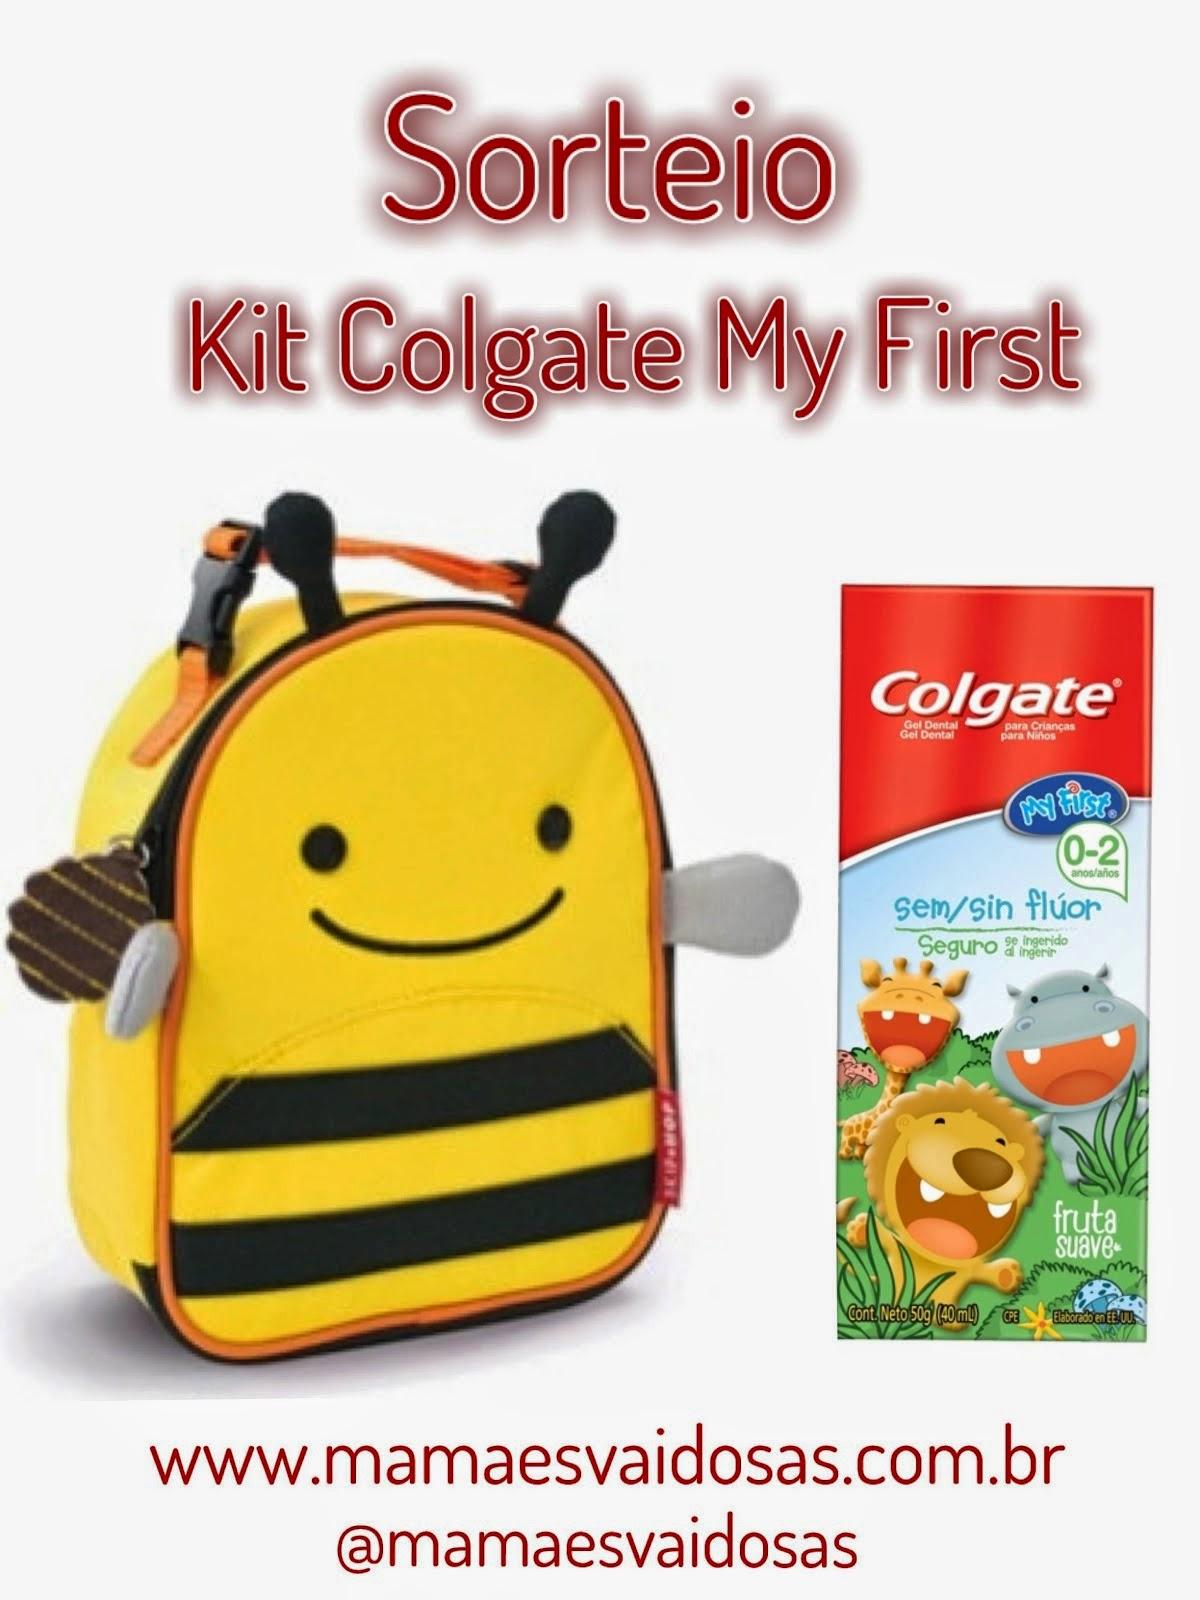 Sorteio Kit Colgate My First